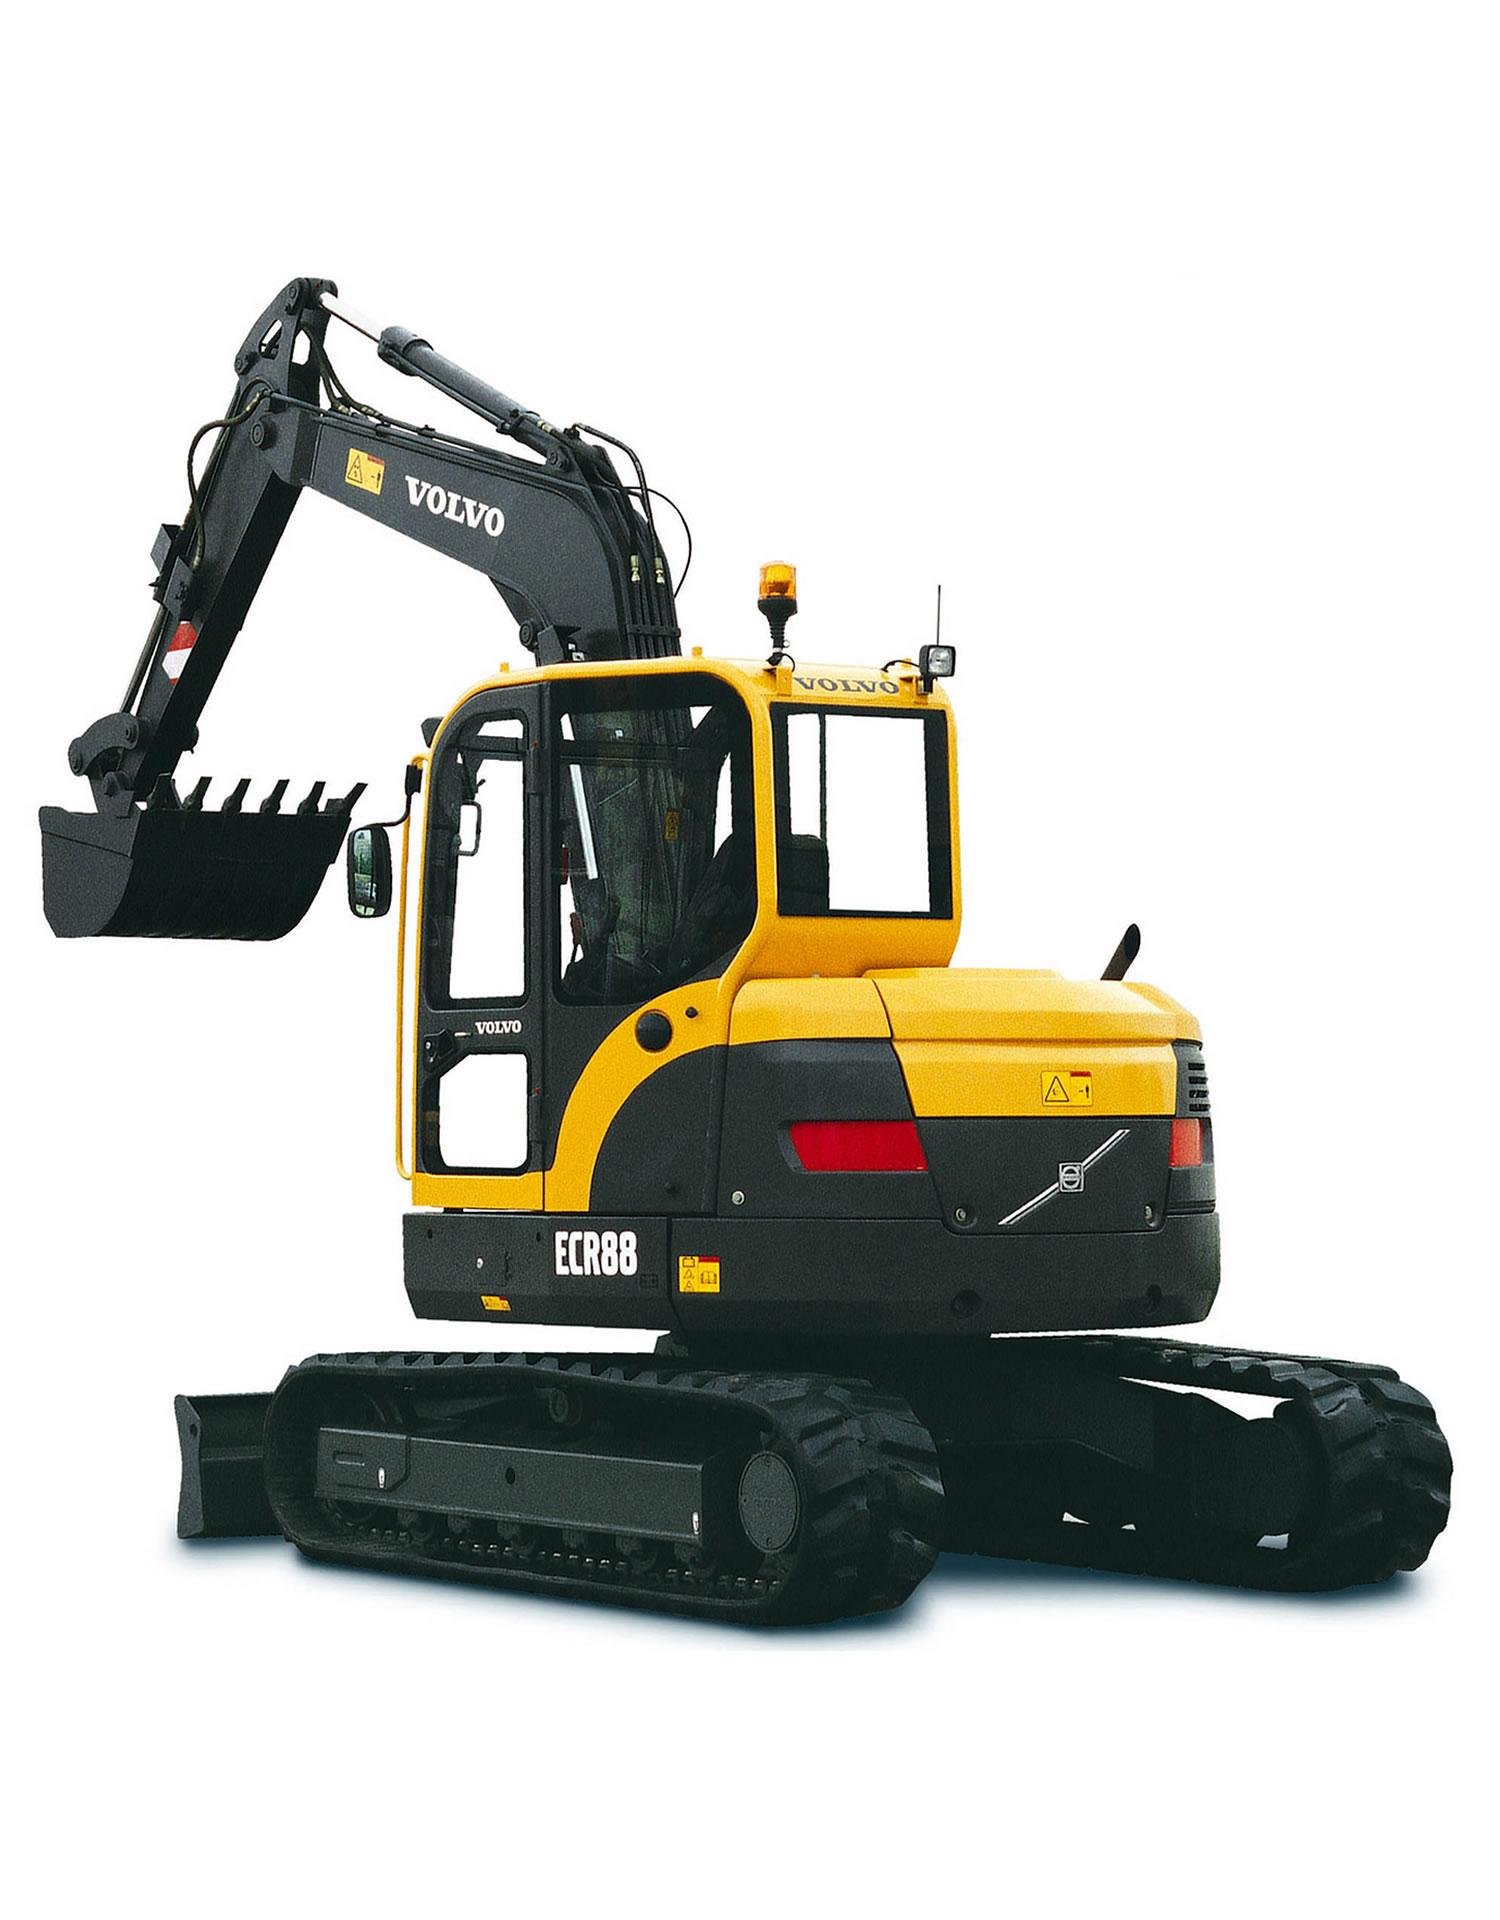 90 Ton Mini Excavator Plant Tool Access and SelfDrive Vehicle